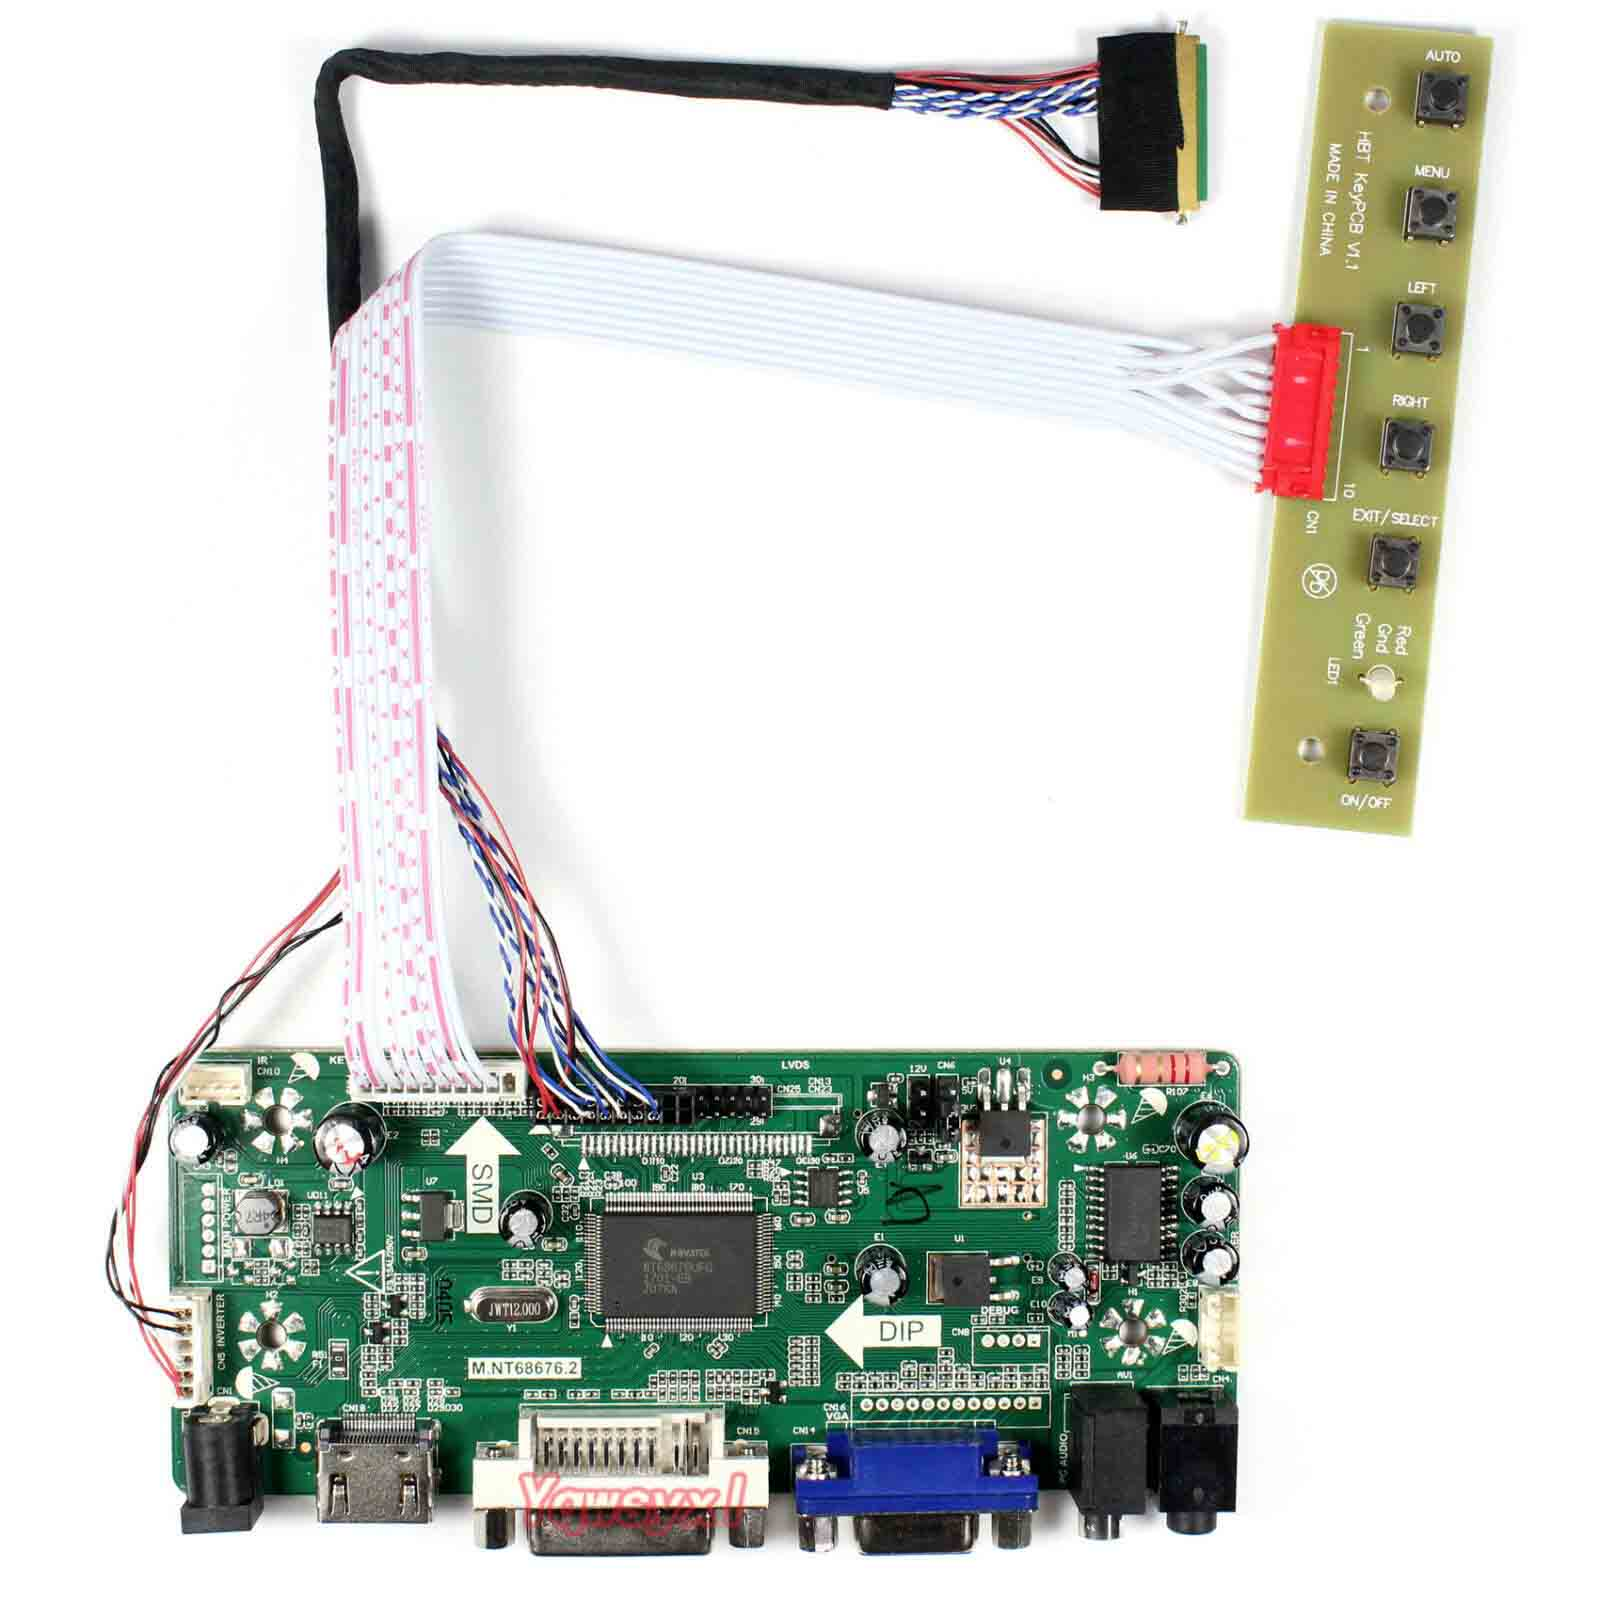 Yqwsyxl Control Board Monitor Kit For B156XTN04.2  HDMI+DVI+VGA LCD LED Screen Controller Board Driver